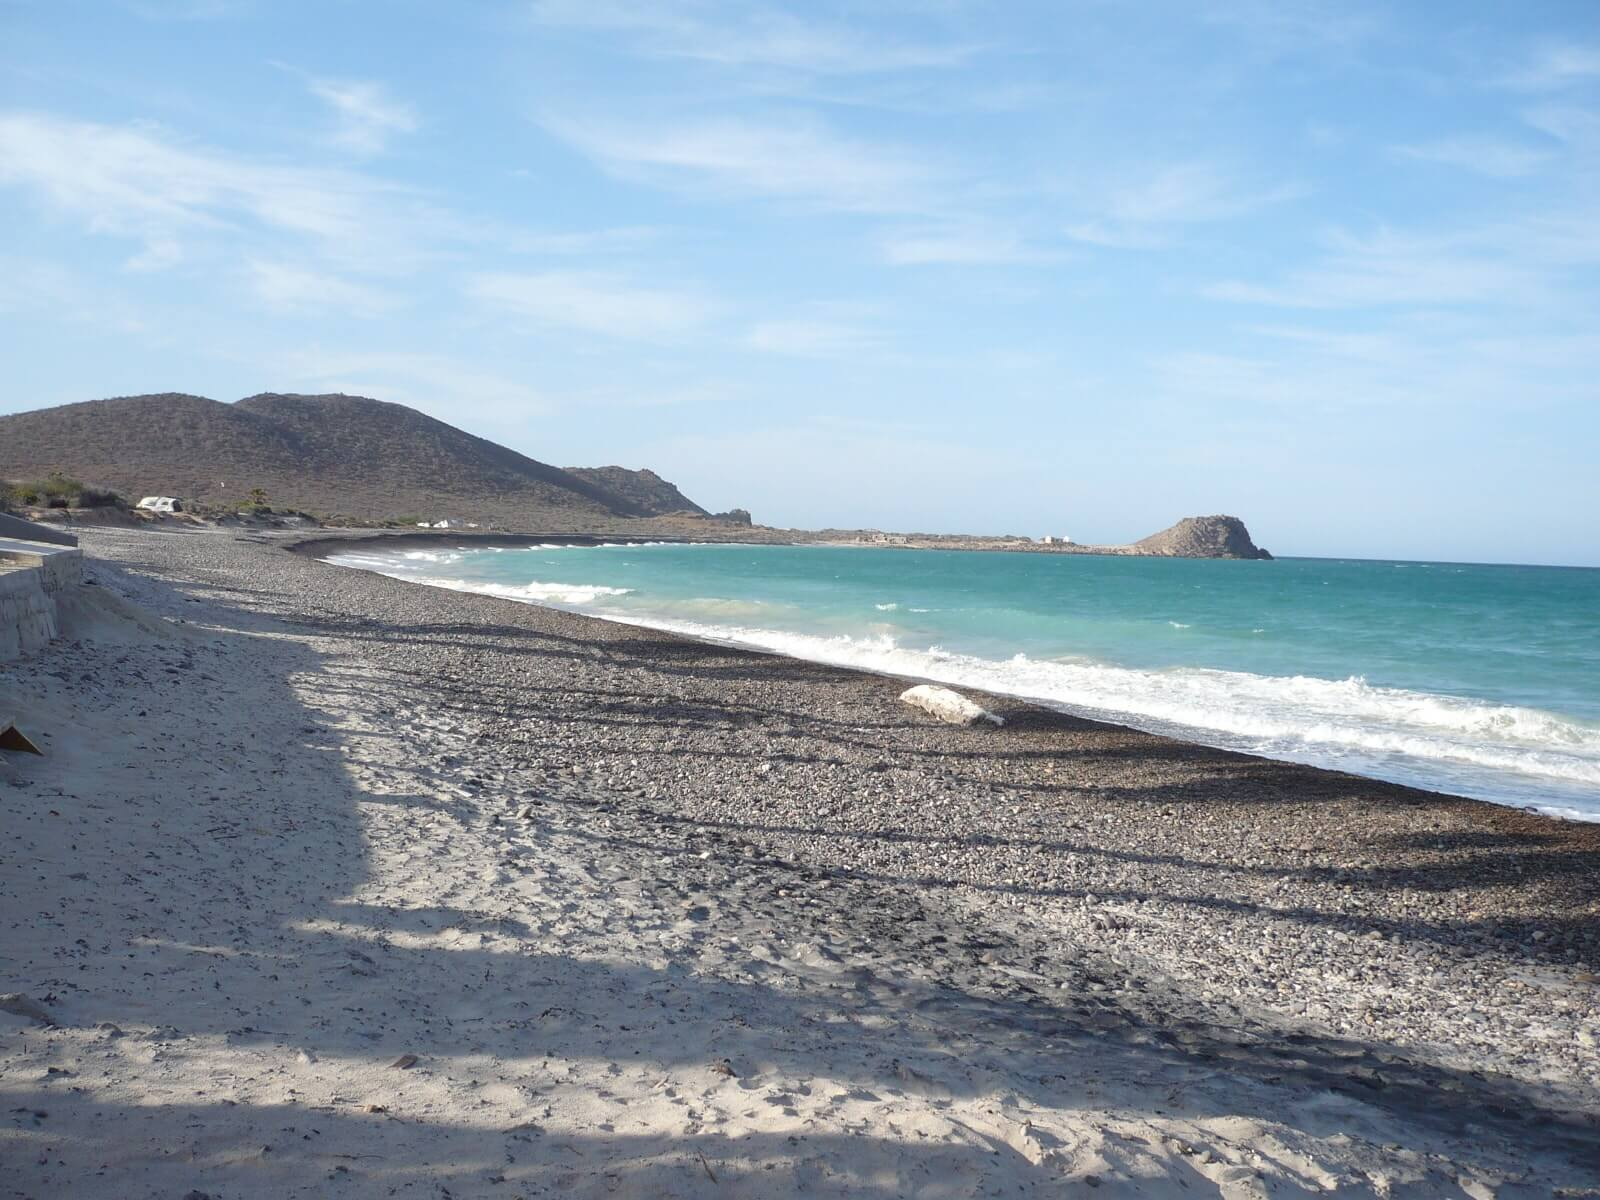 пляж мигриньо картинка